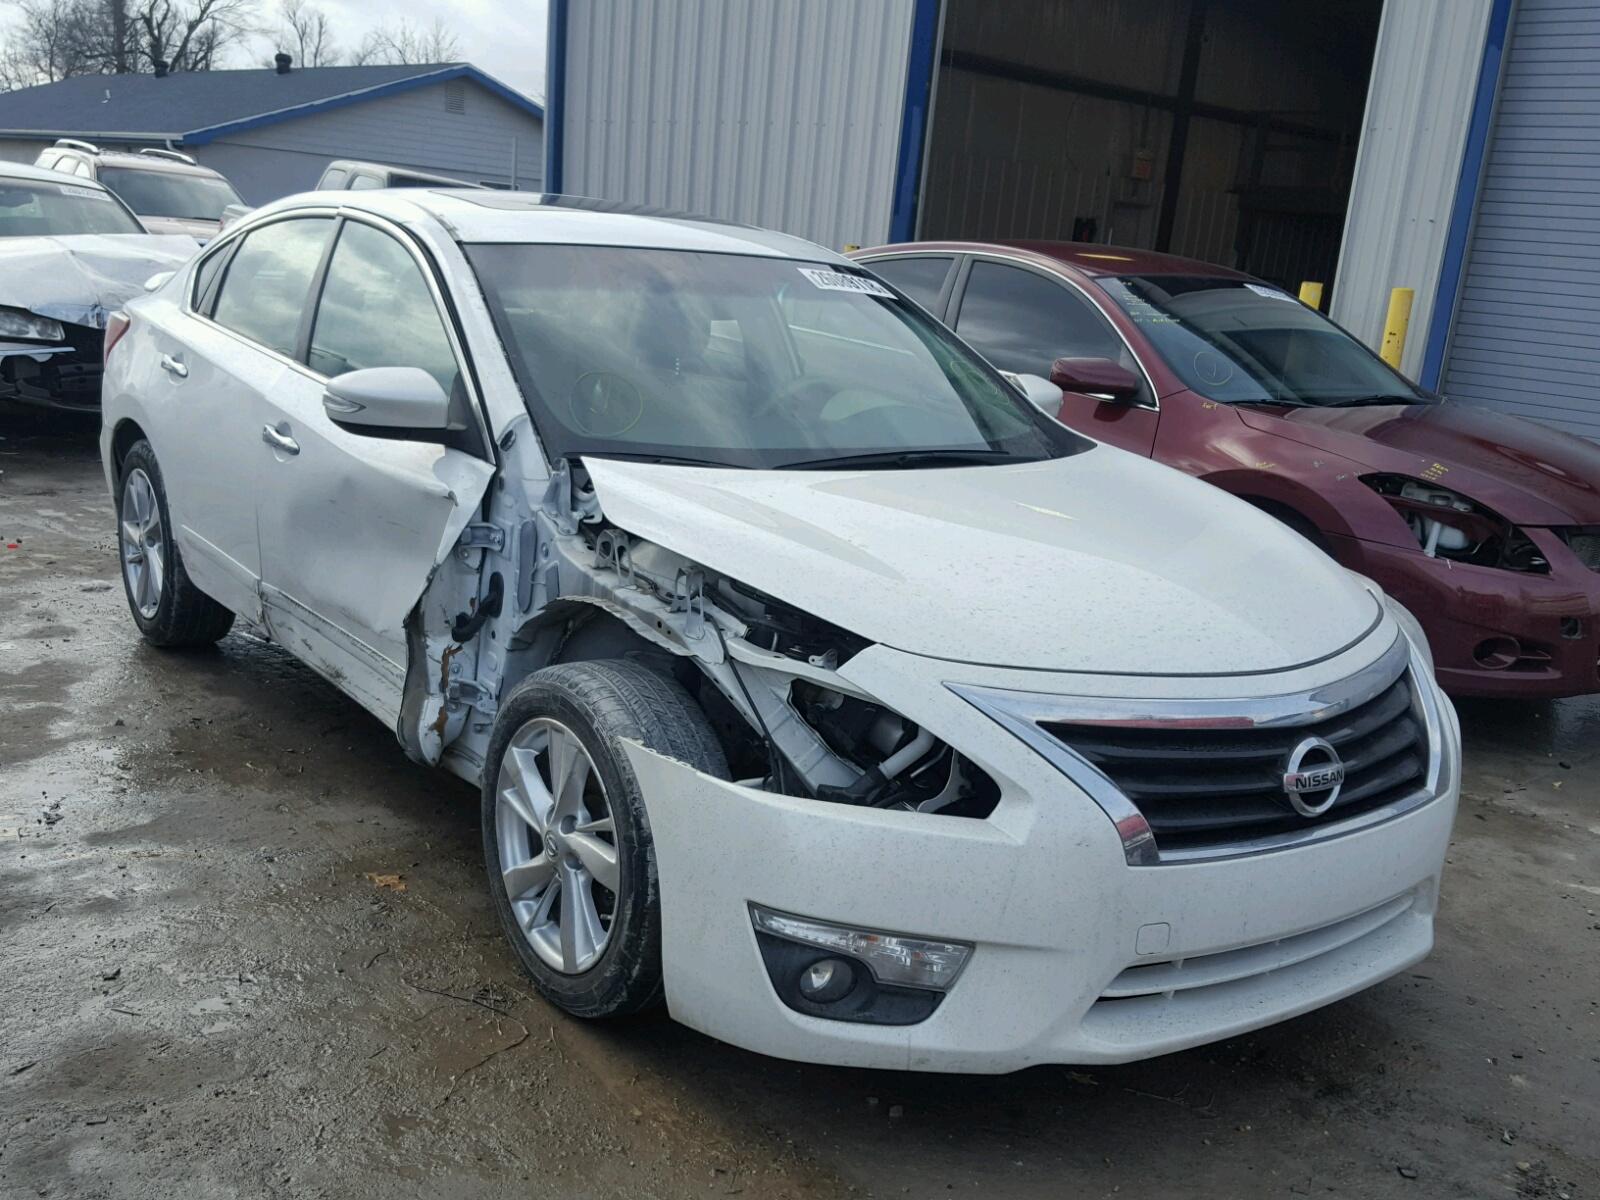 sl atlanta sale listings motors georgia used conyers nissan logic sv cars altima for